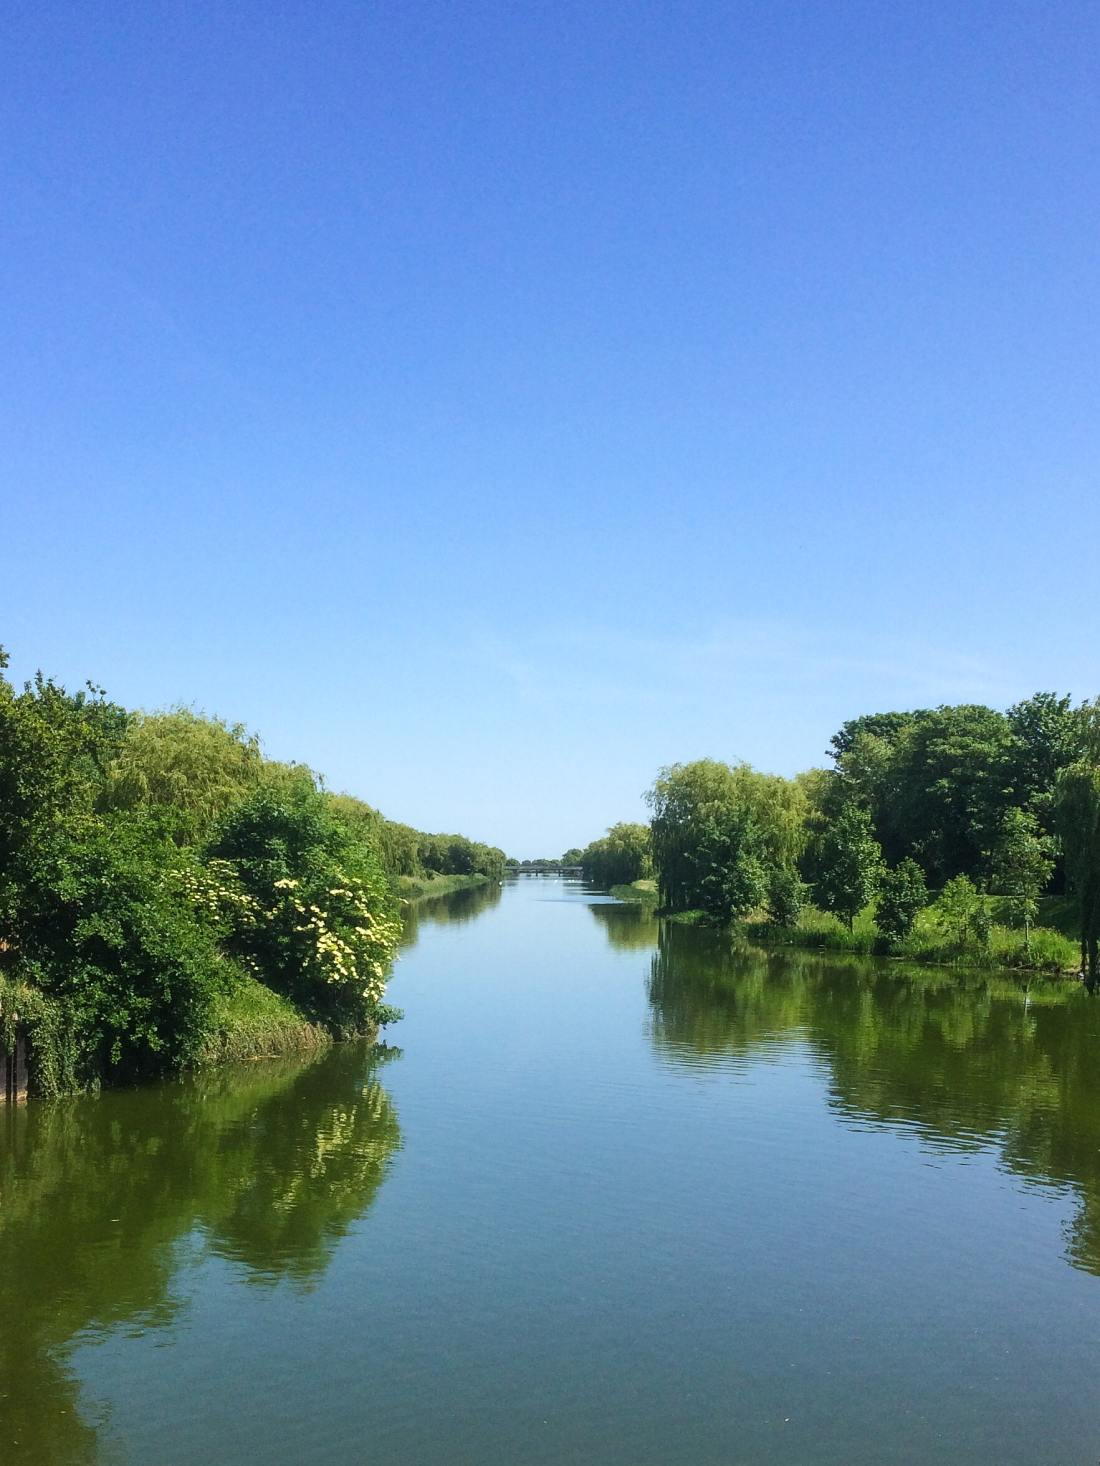 water-trees-green-blue-sky-4507089